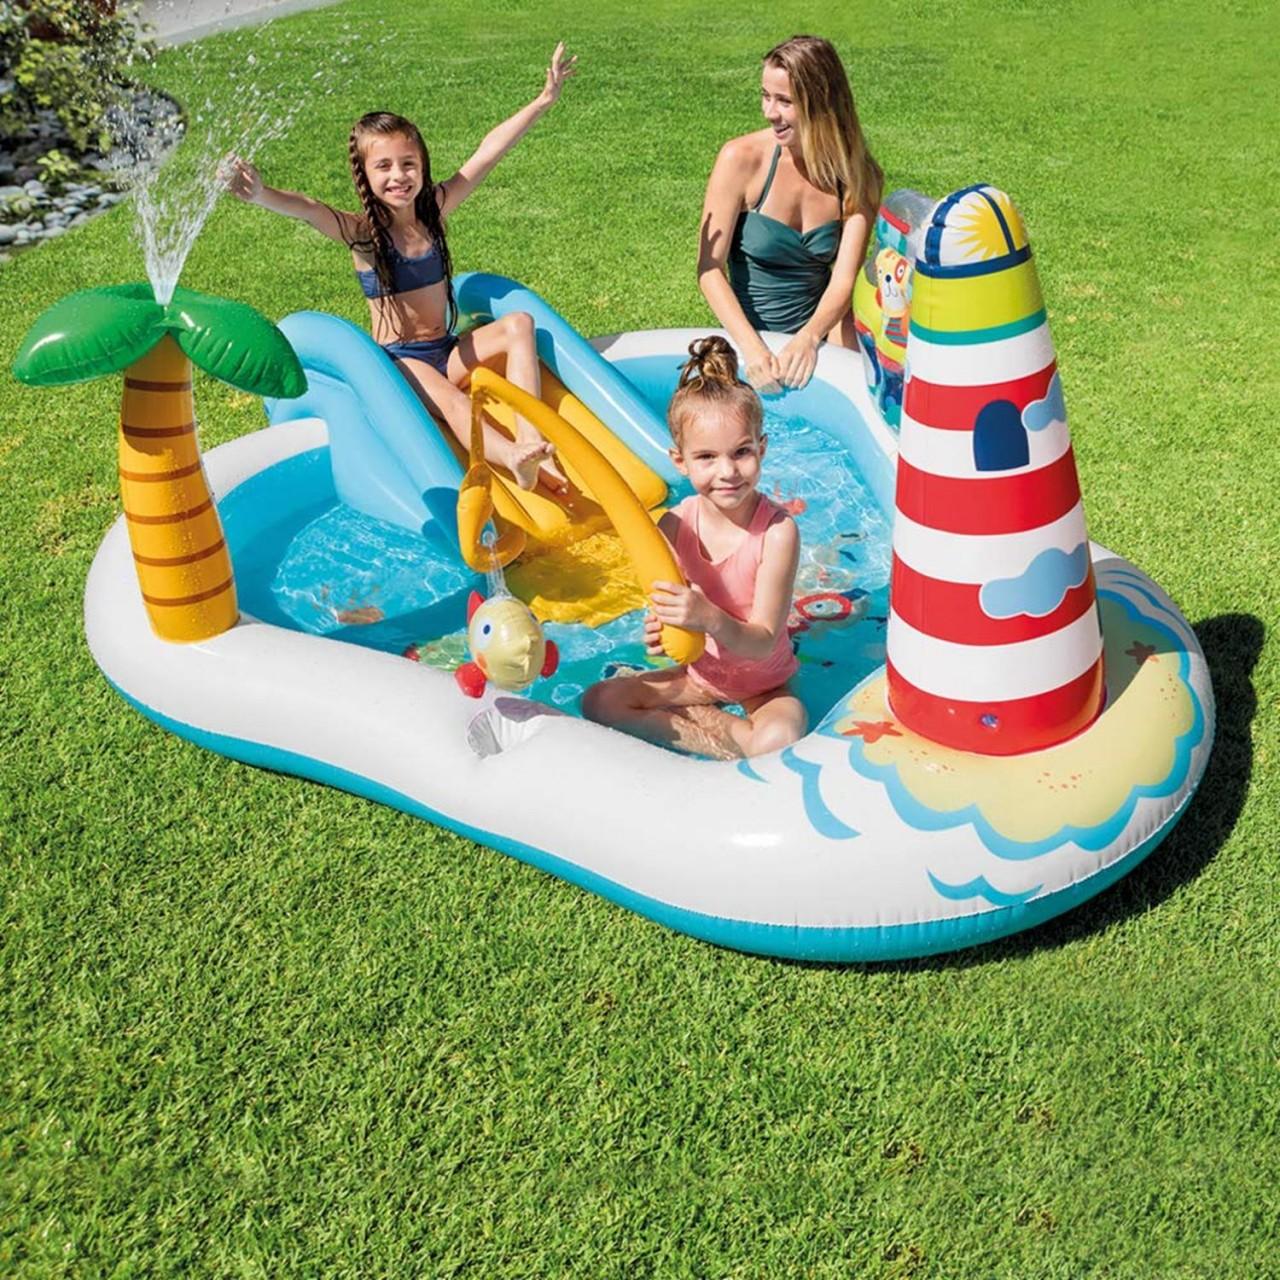 Intex Play Center Fishing Fun Planschbecken Pool Wasserrutsche aufblasbar 57162